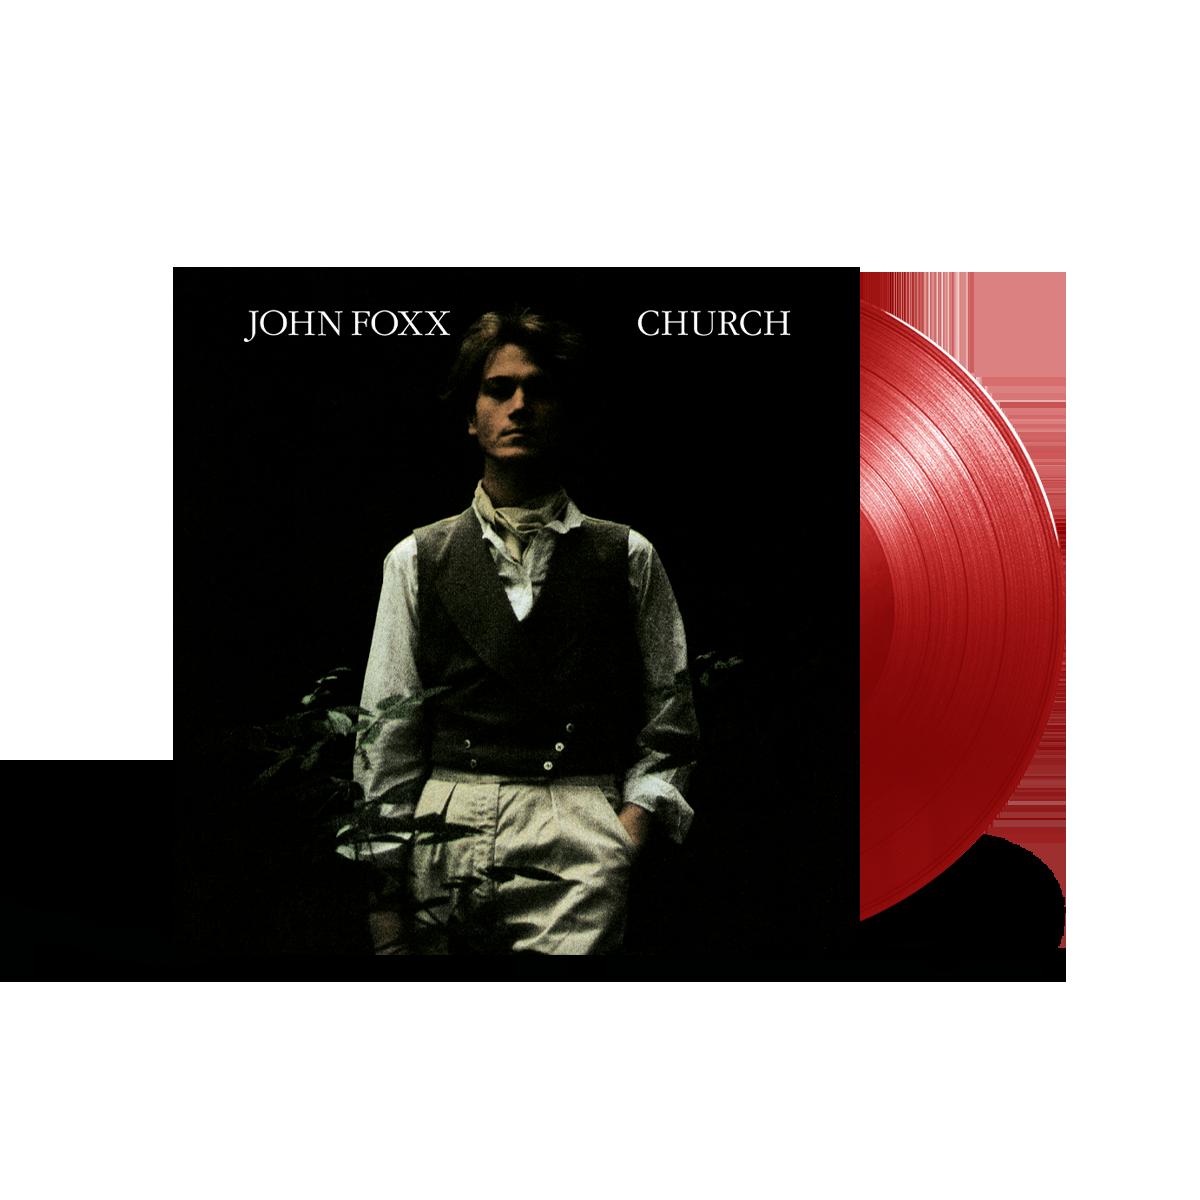 Buy Online John Foxx - Church Ltd Edition Transparent Red Vinyl